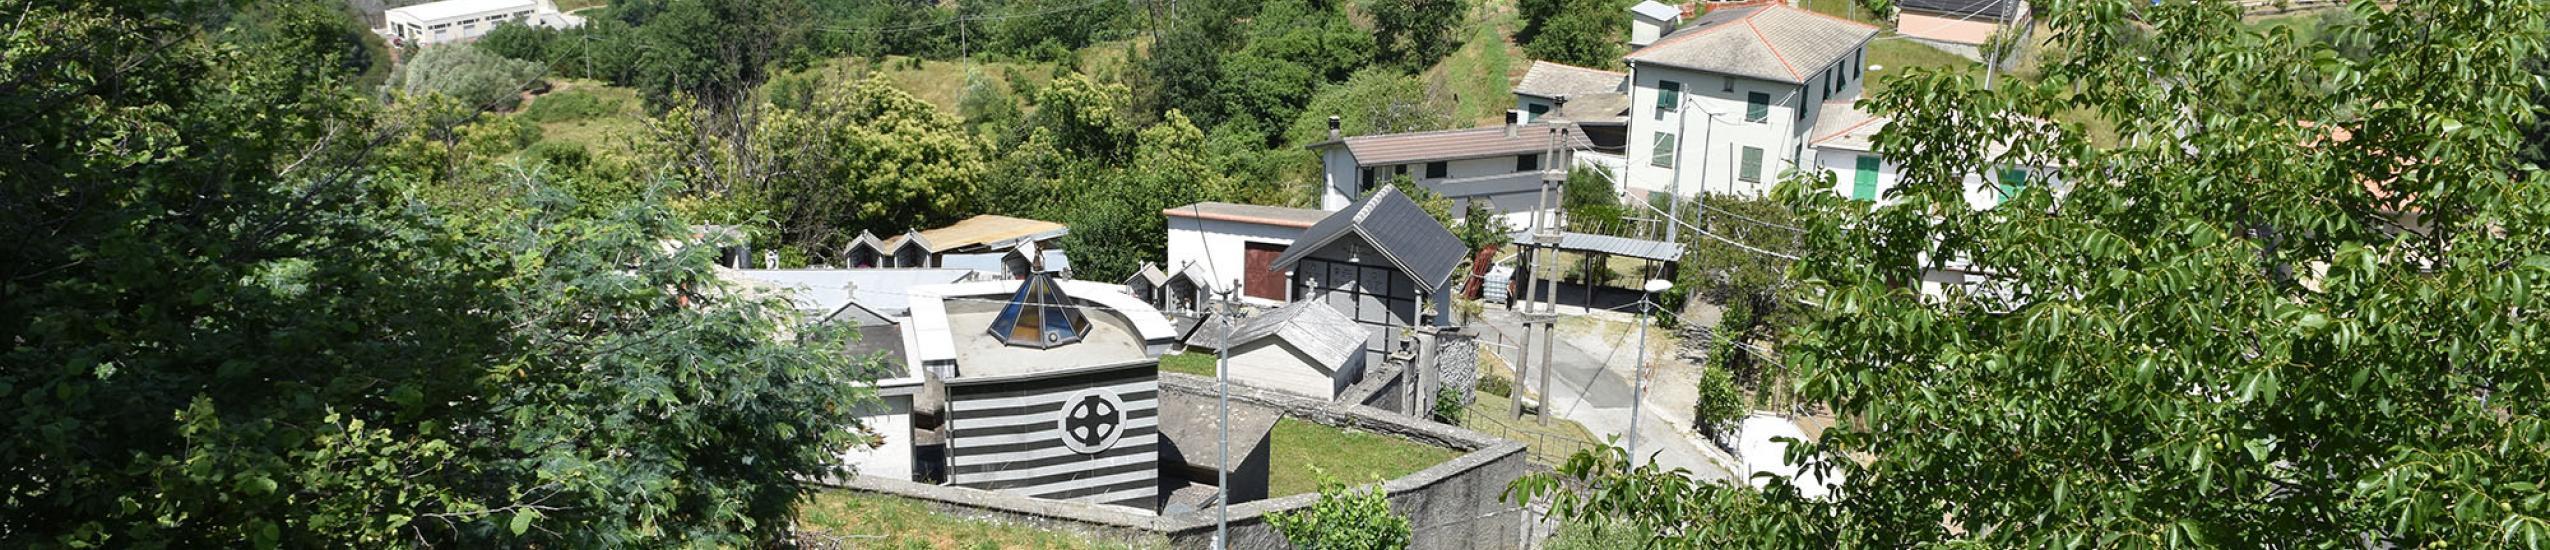 Cimitero di Serra